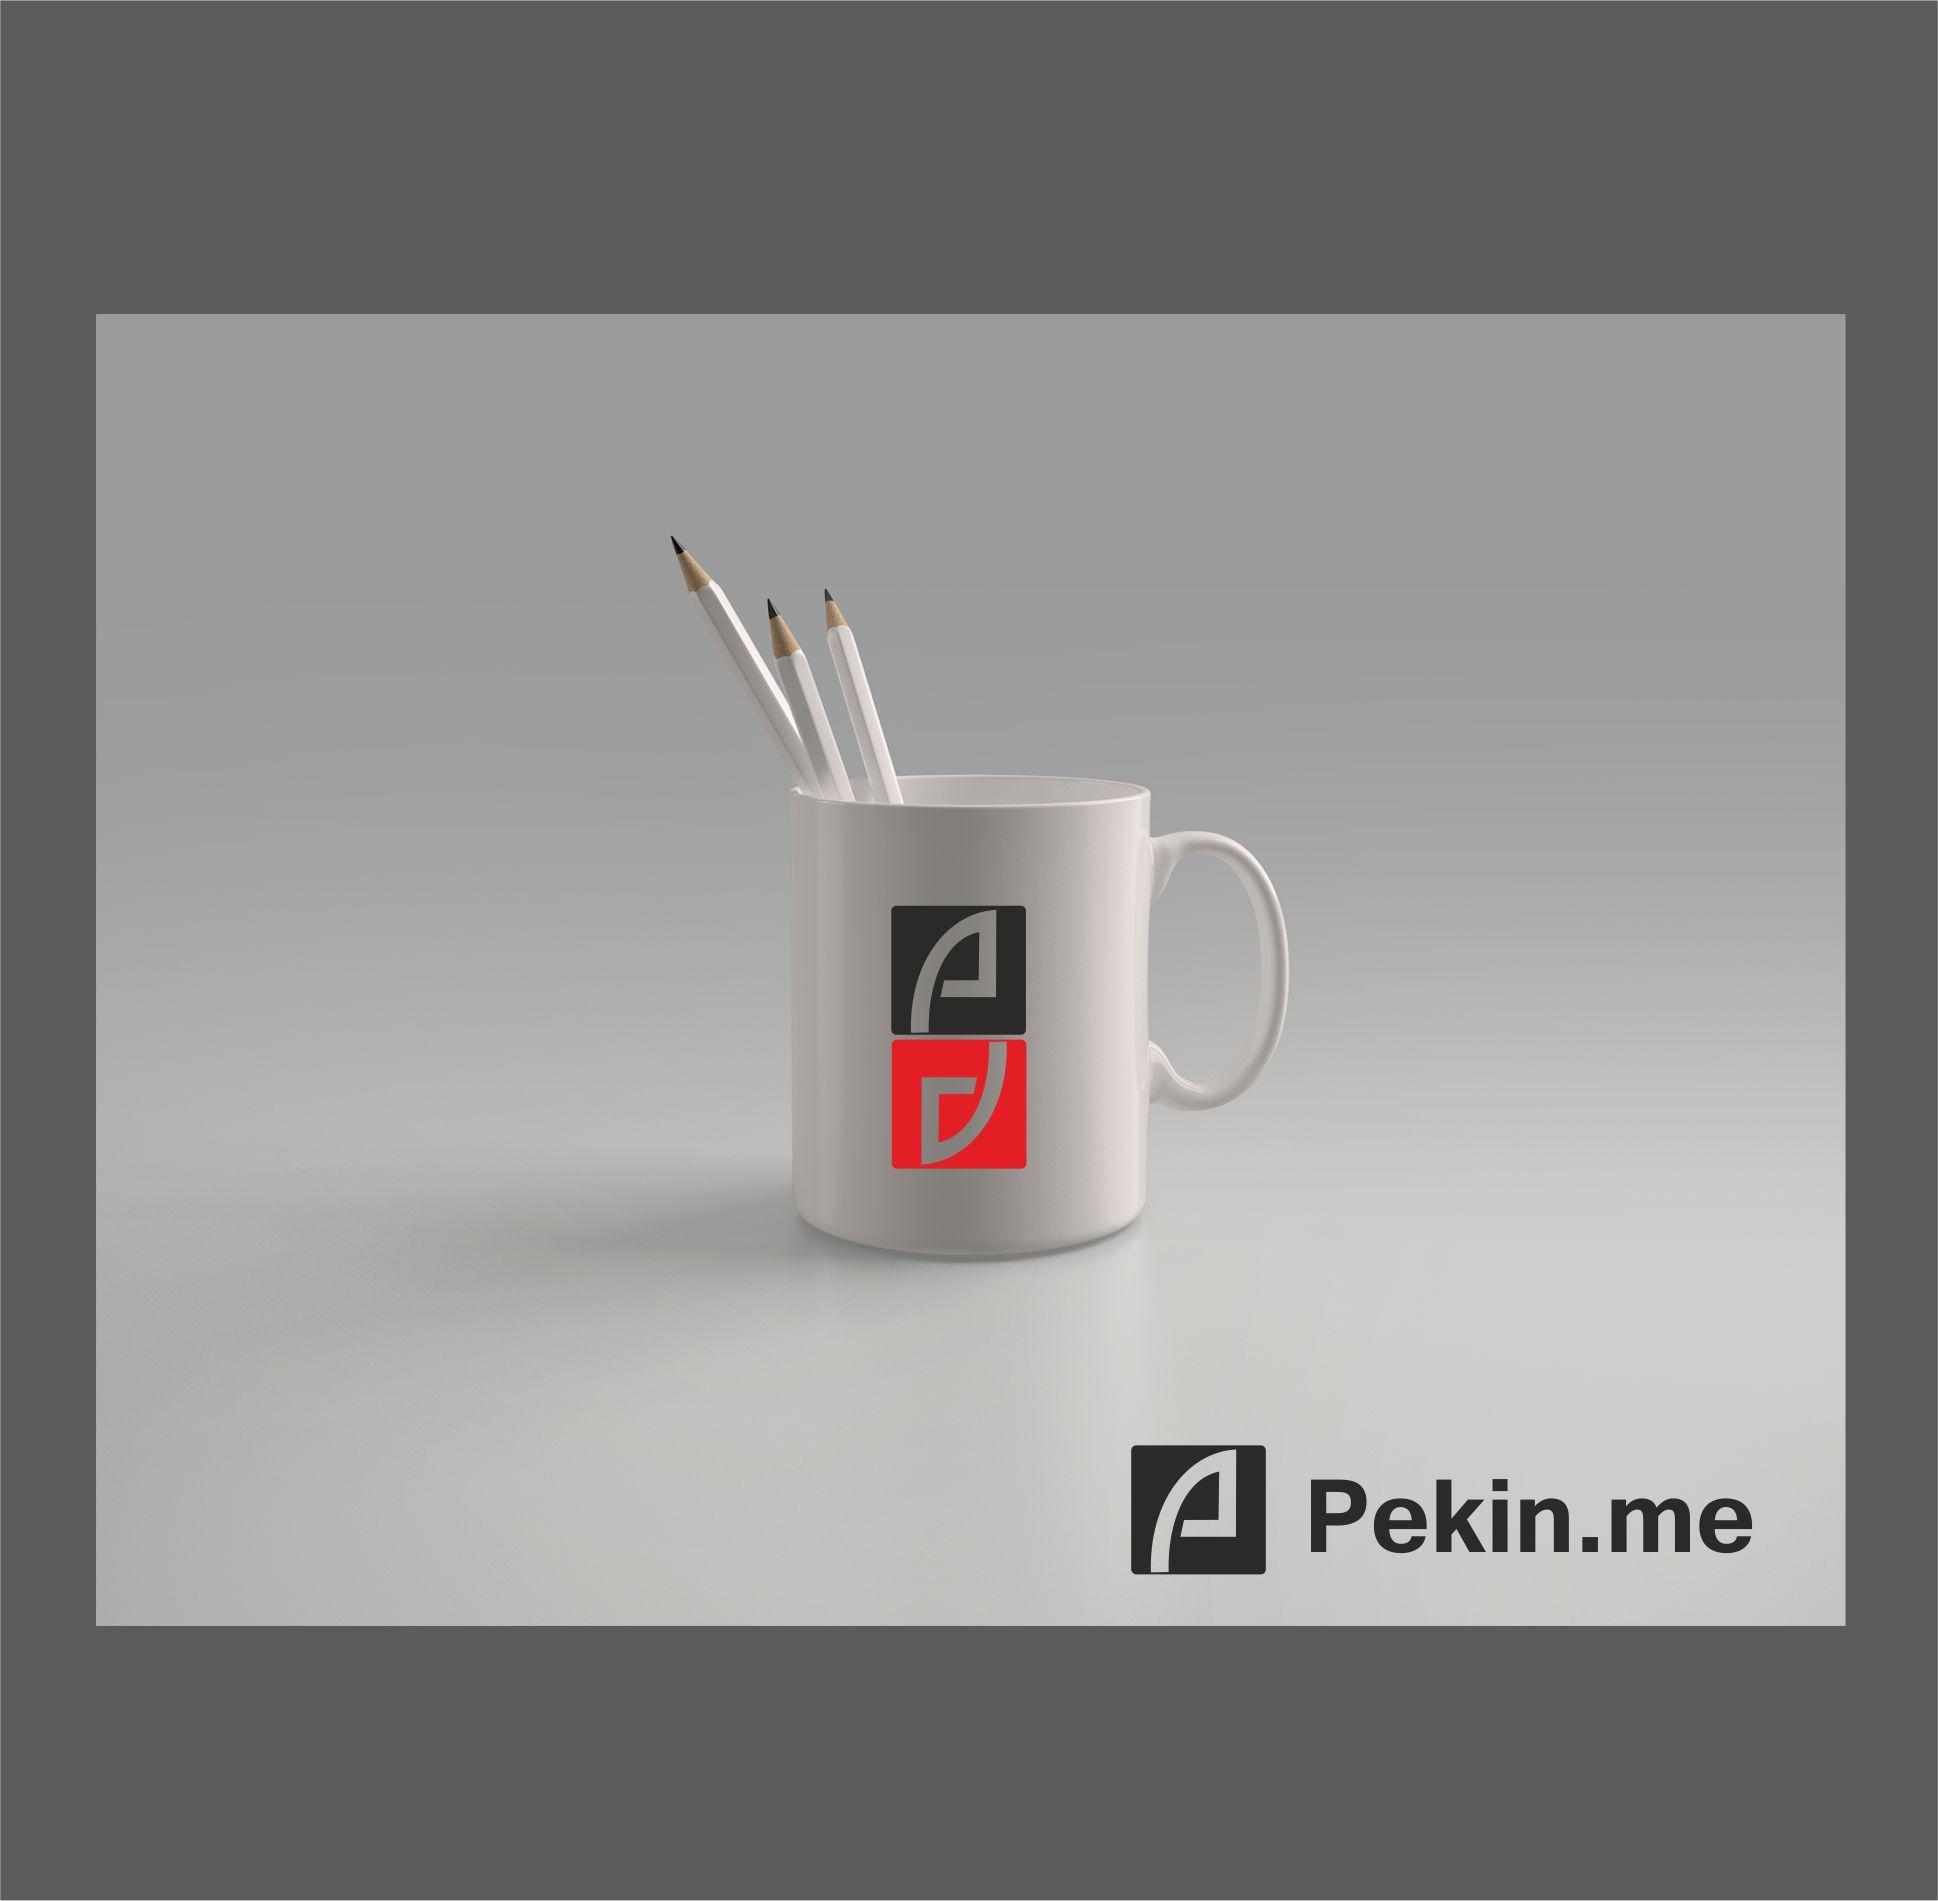 Логотип для компании pekin.me - дизайнер dbyjuhfl